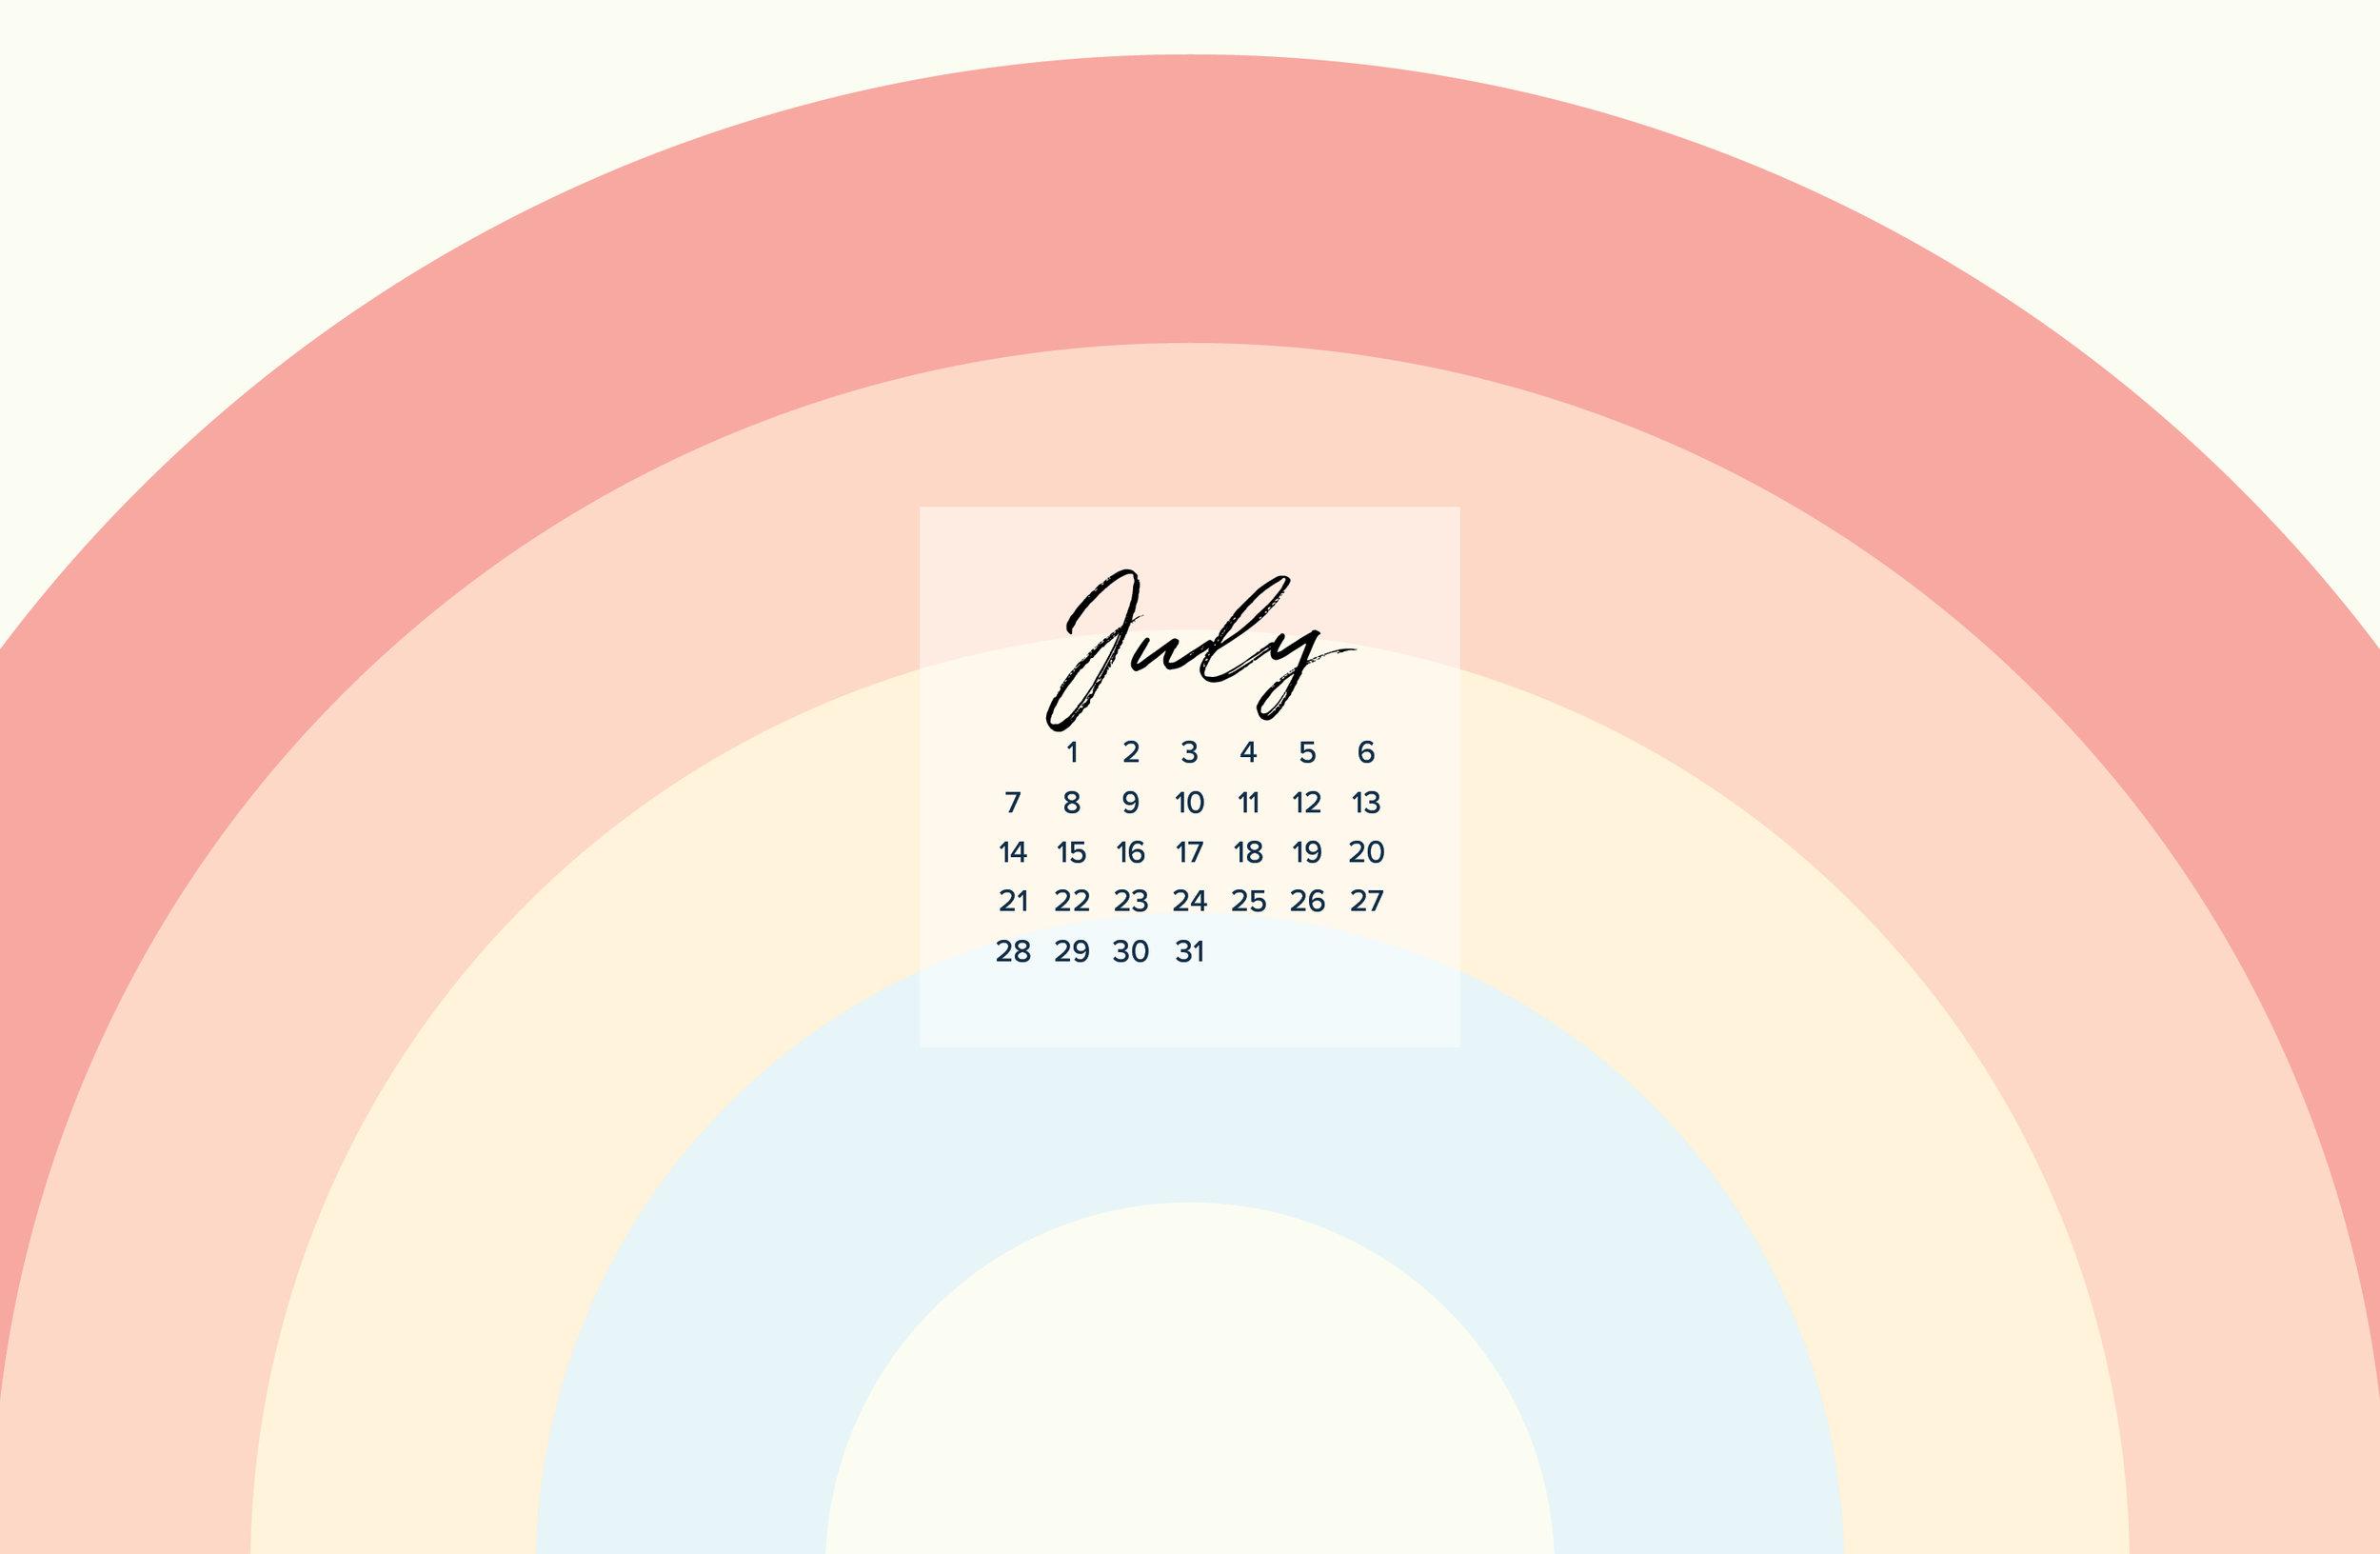 July_Summer_Freebies_2a.jpg